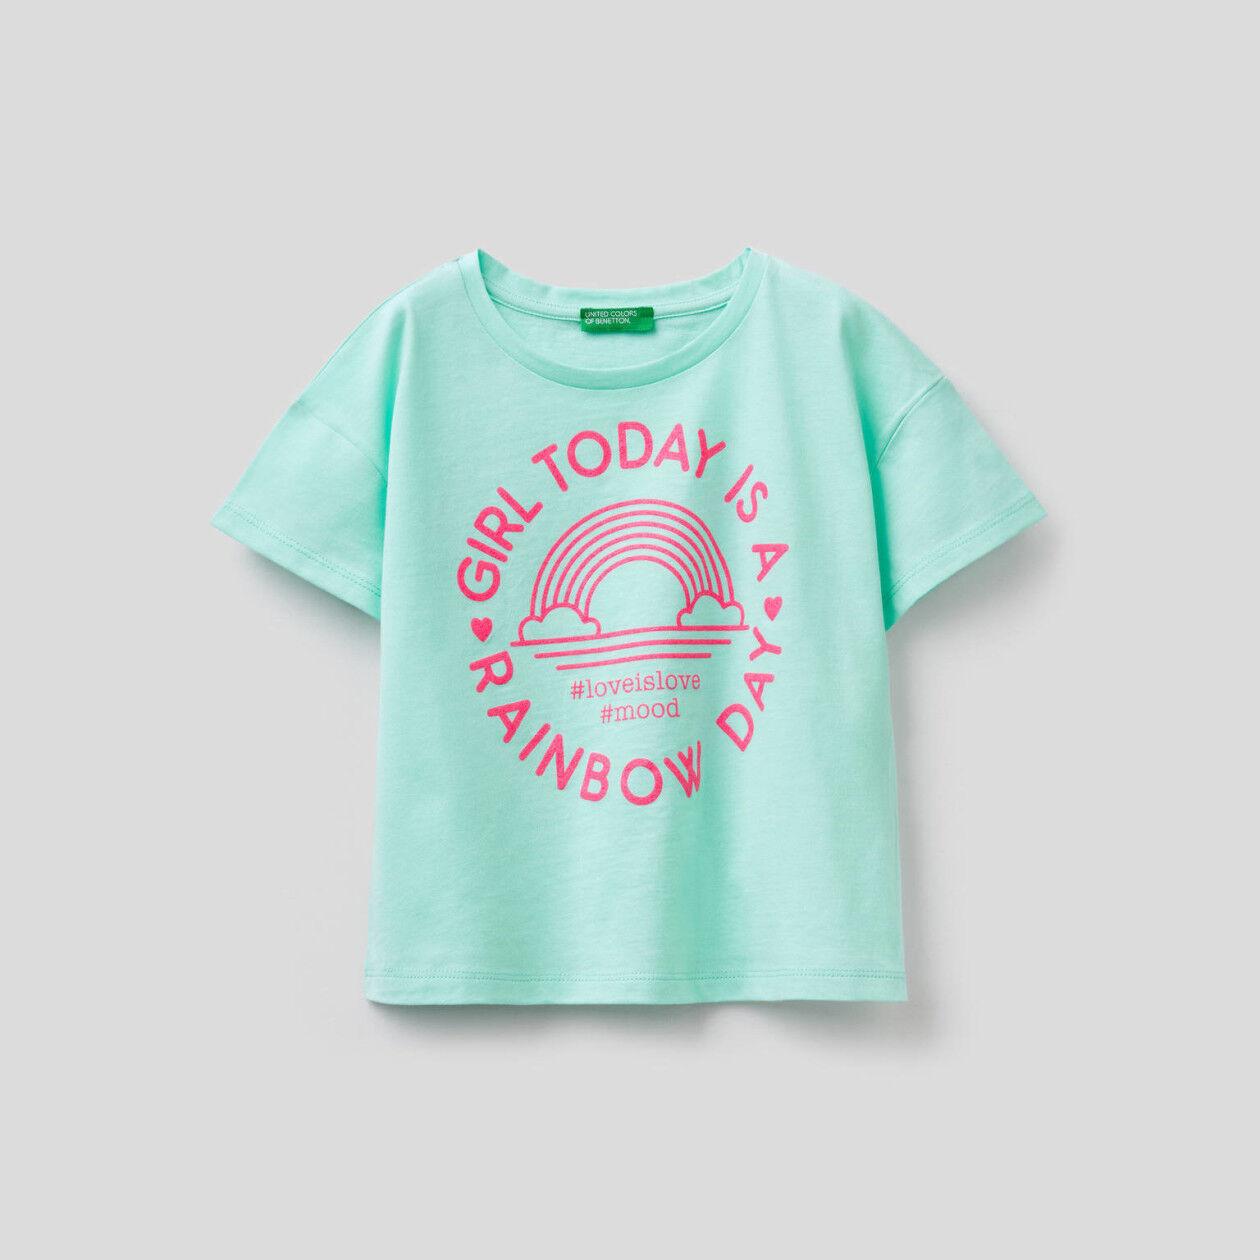 Camiseta boxy de algodón puro